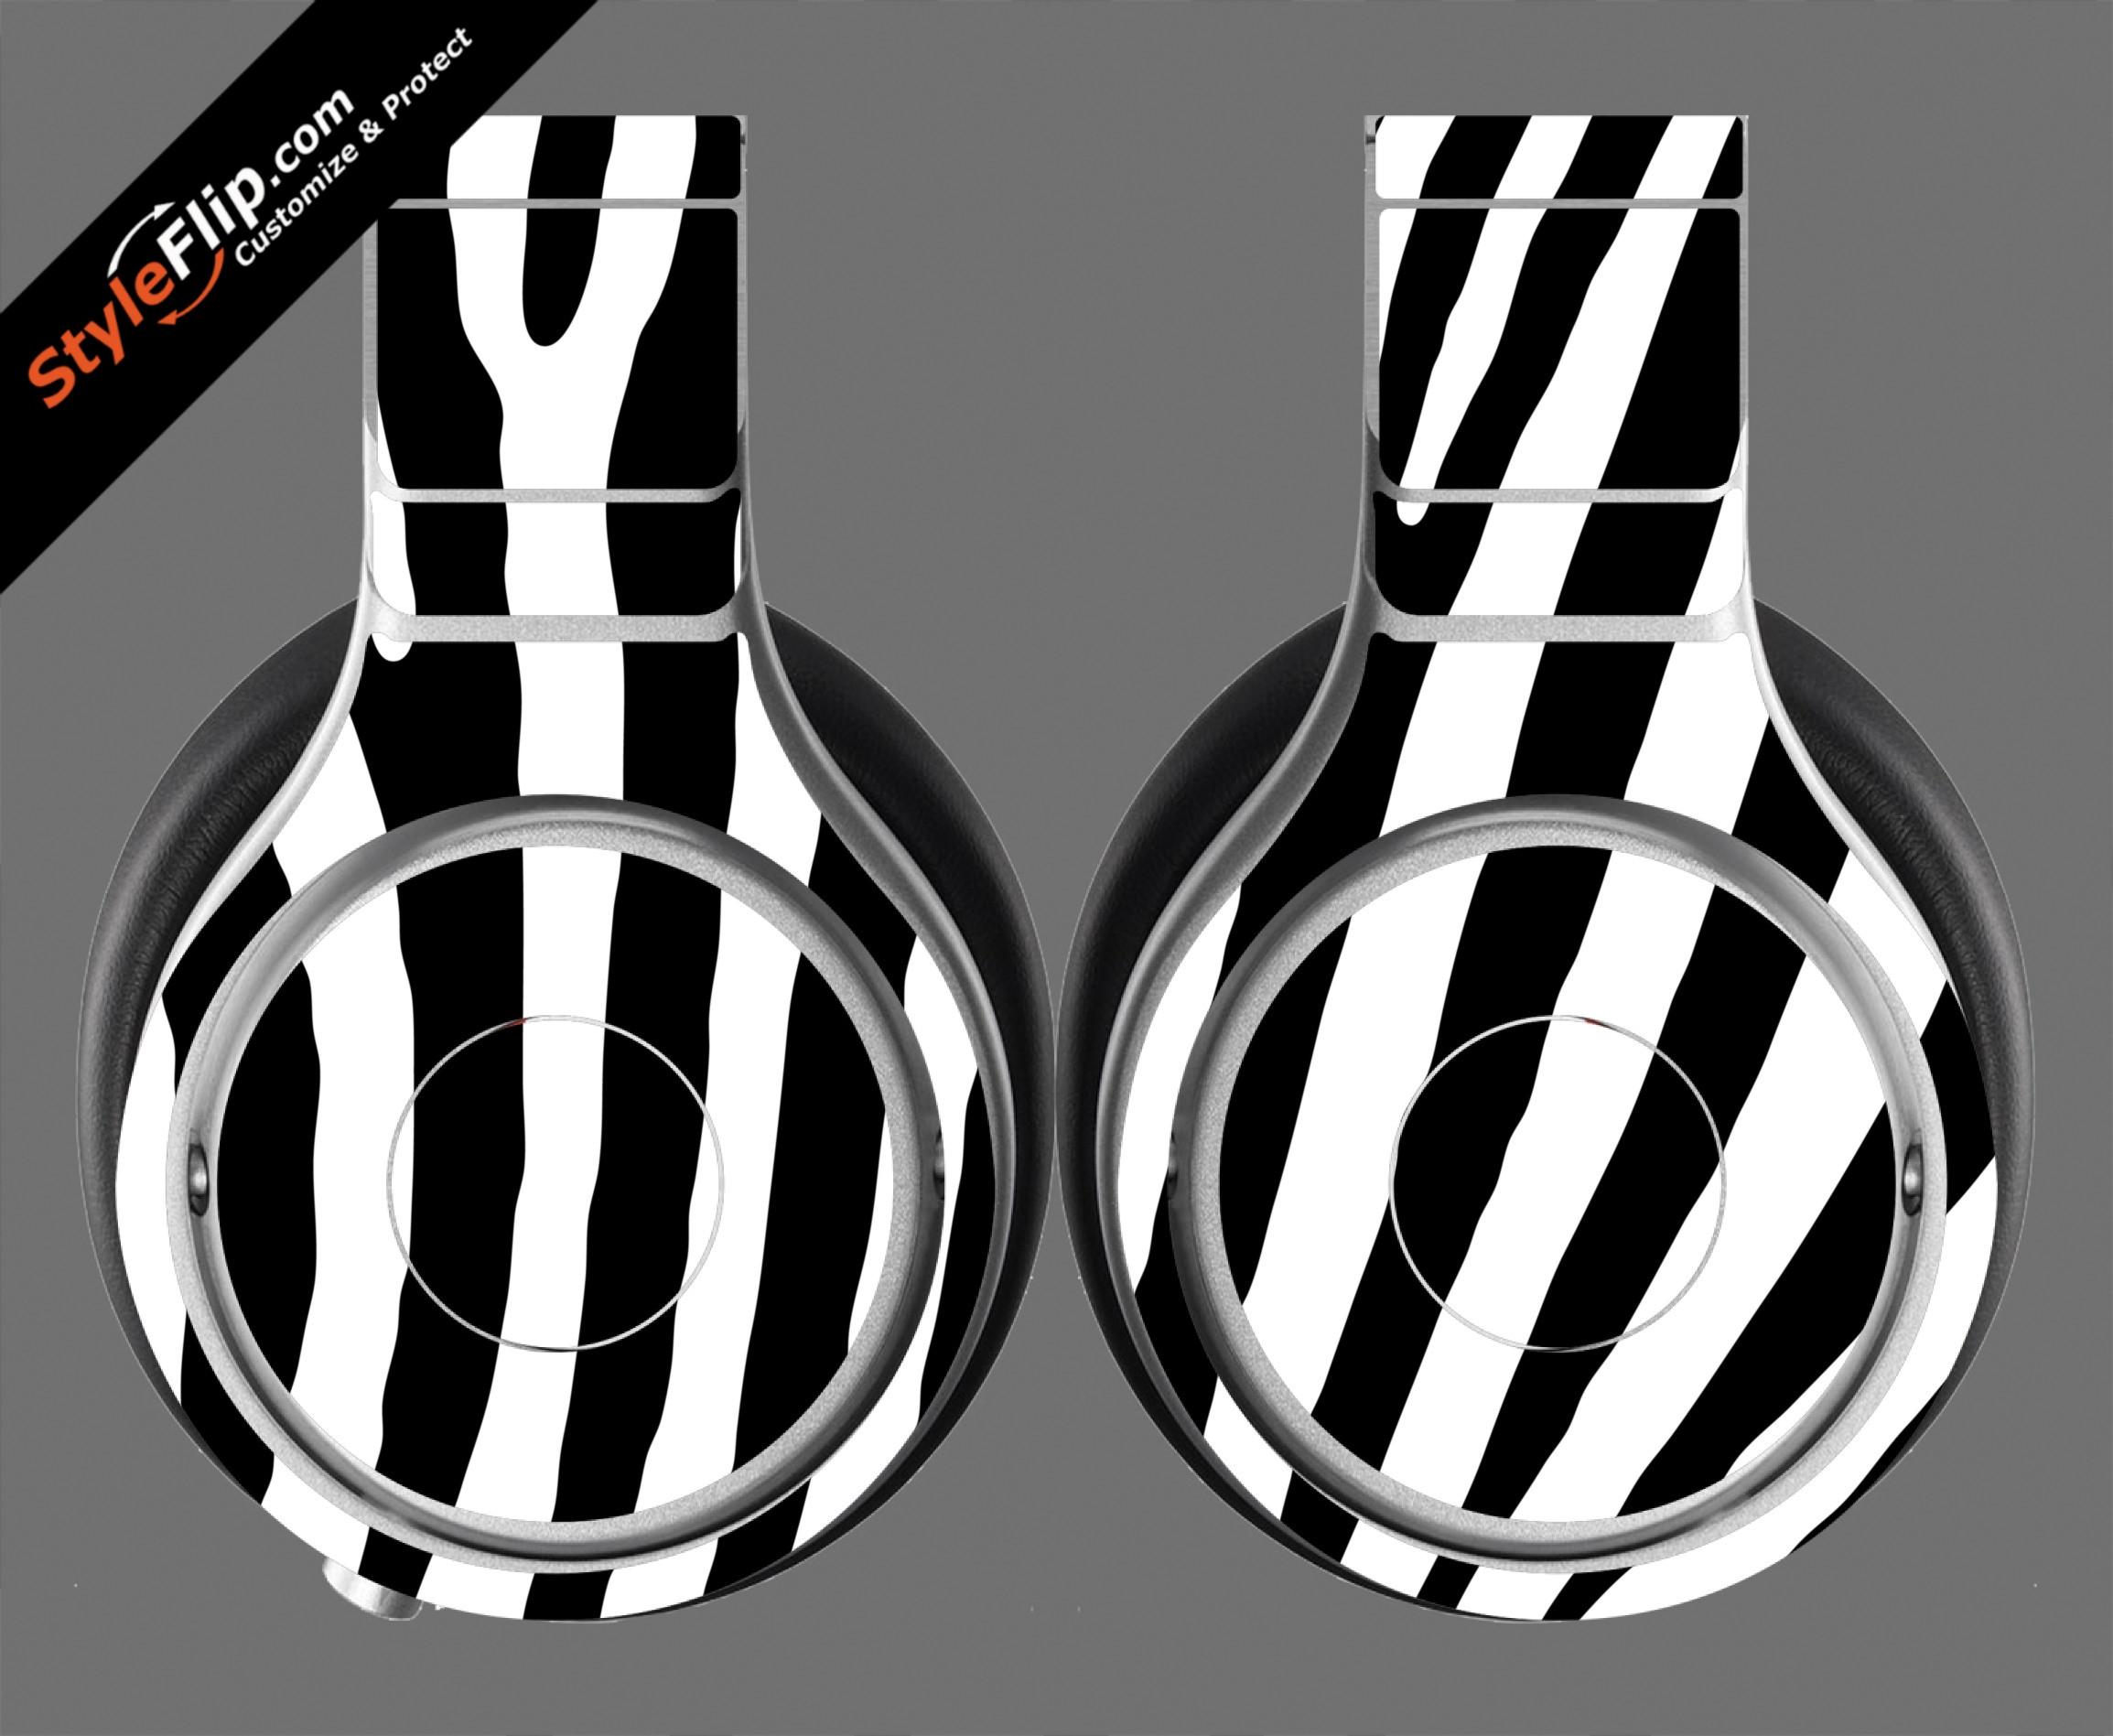 Zebra Print Beats By Dr. Dre Beats Pro Model